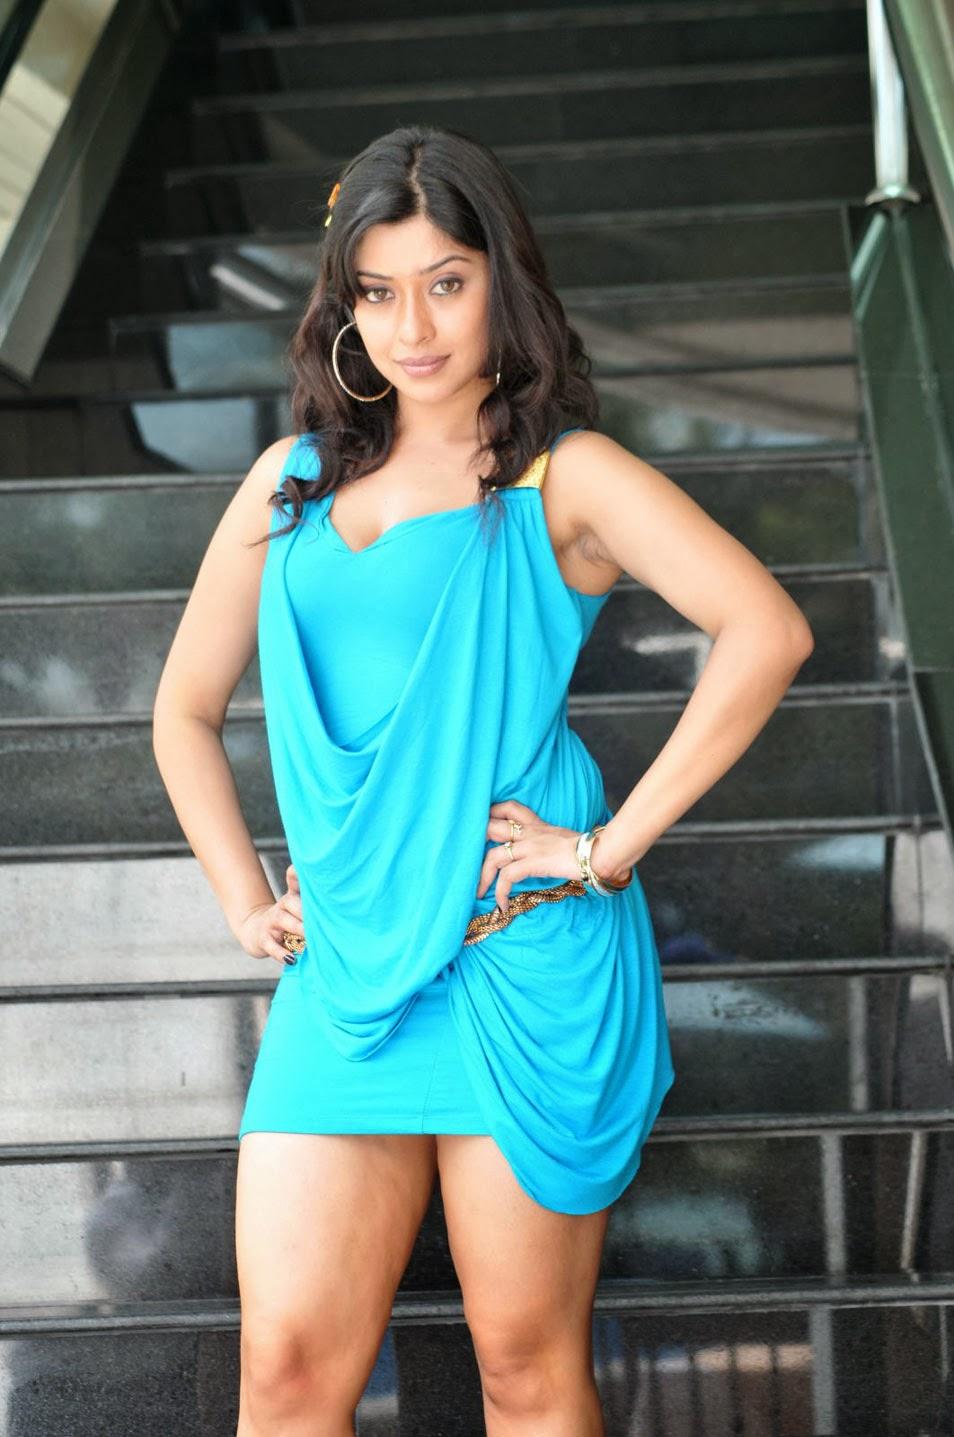 Katrina Kaif Sexy Video Xnxx